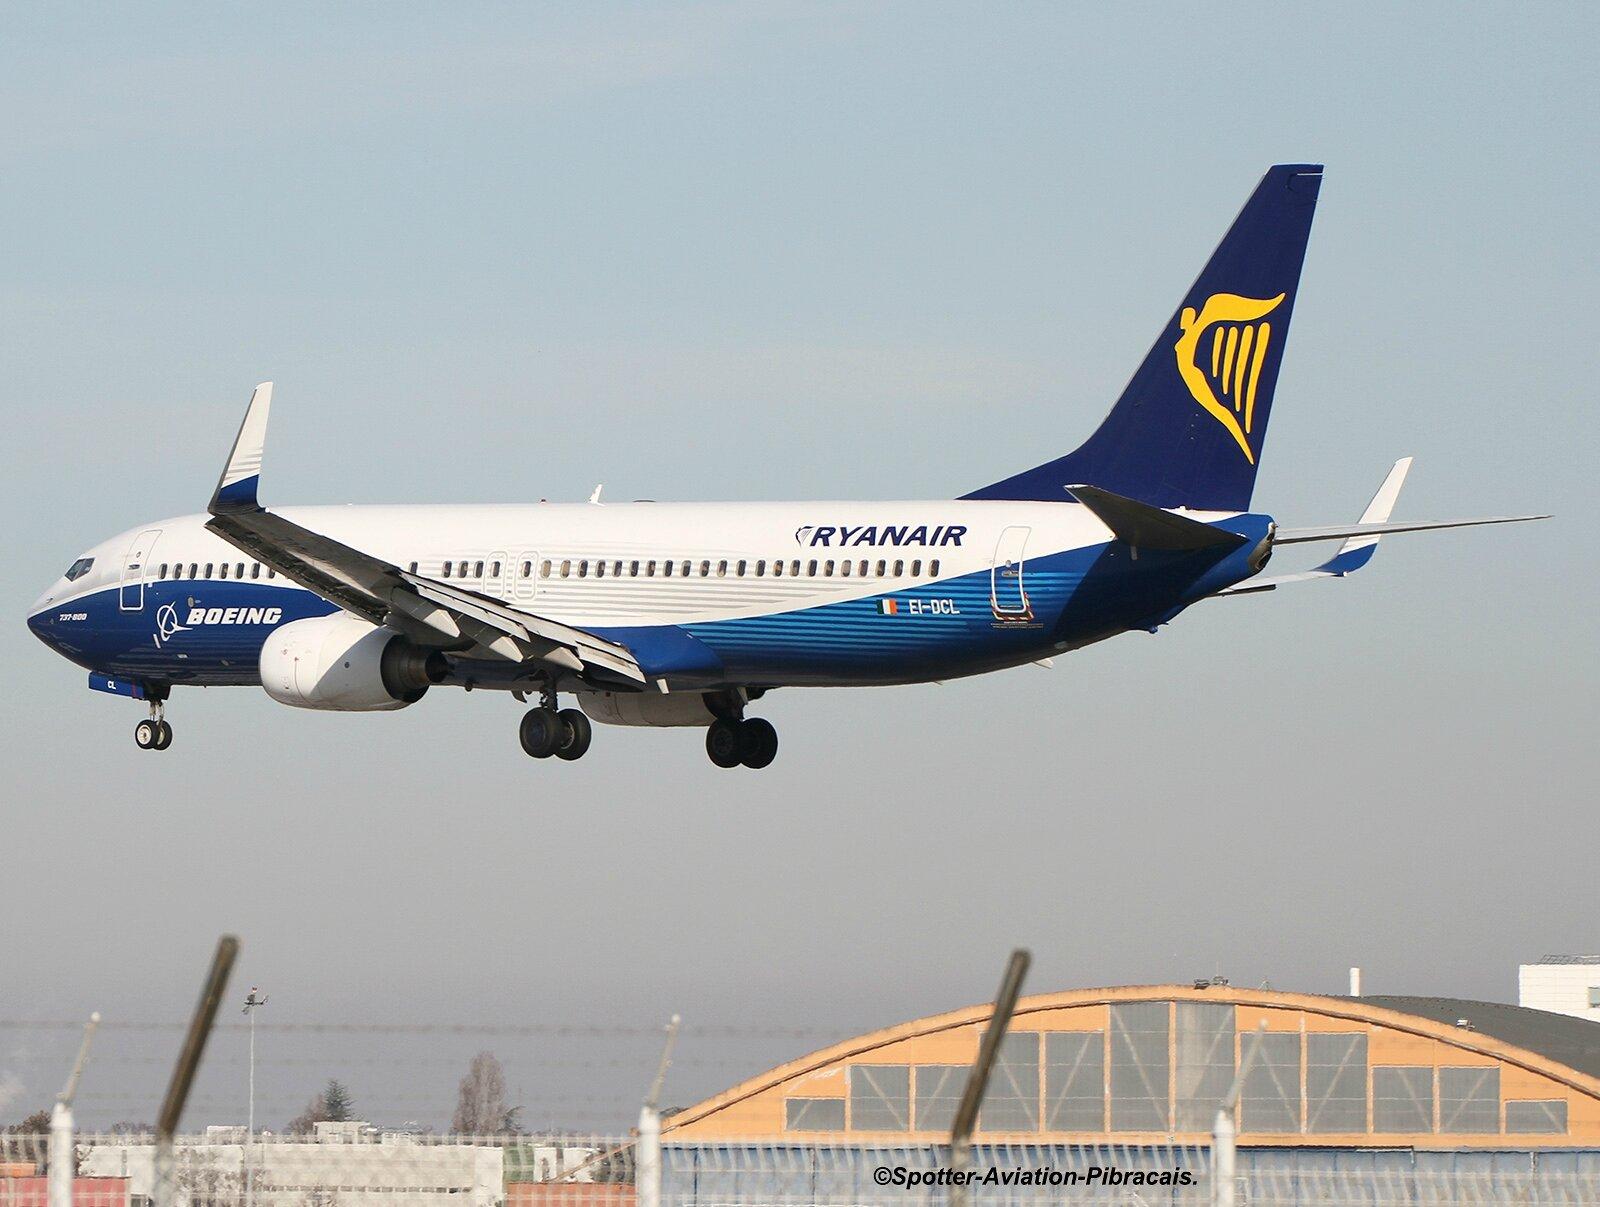 Ryanair (DREAMLINER)